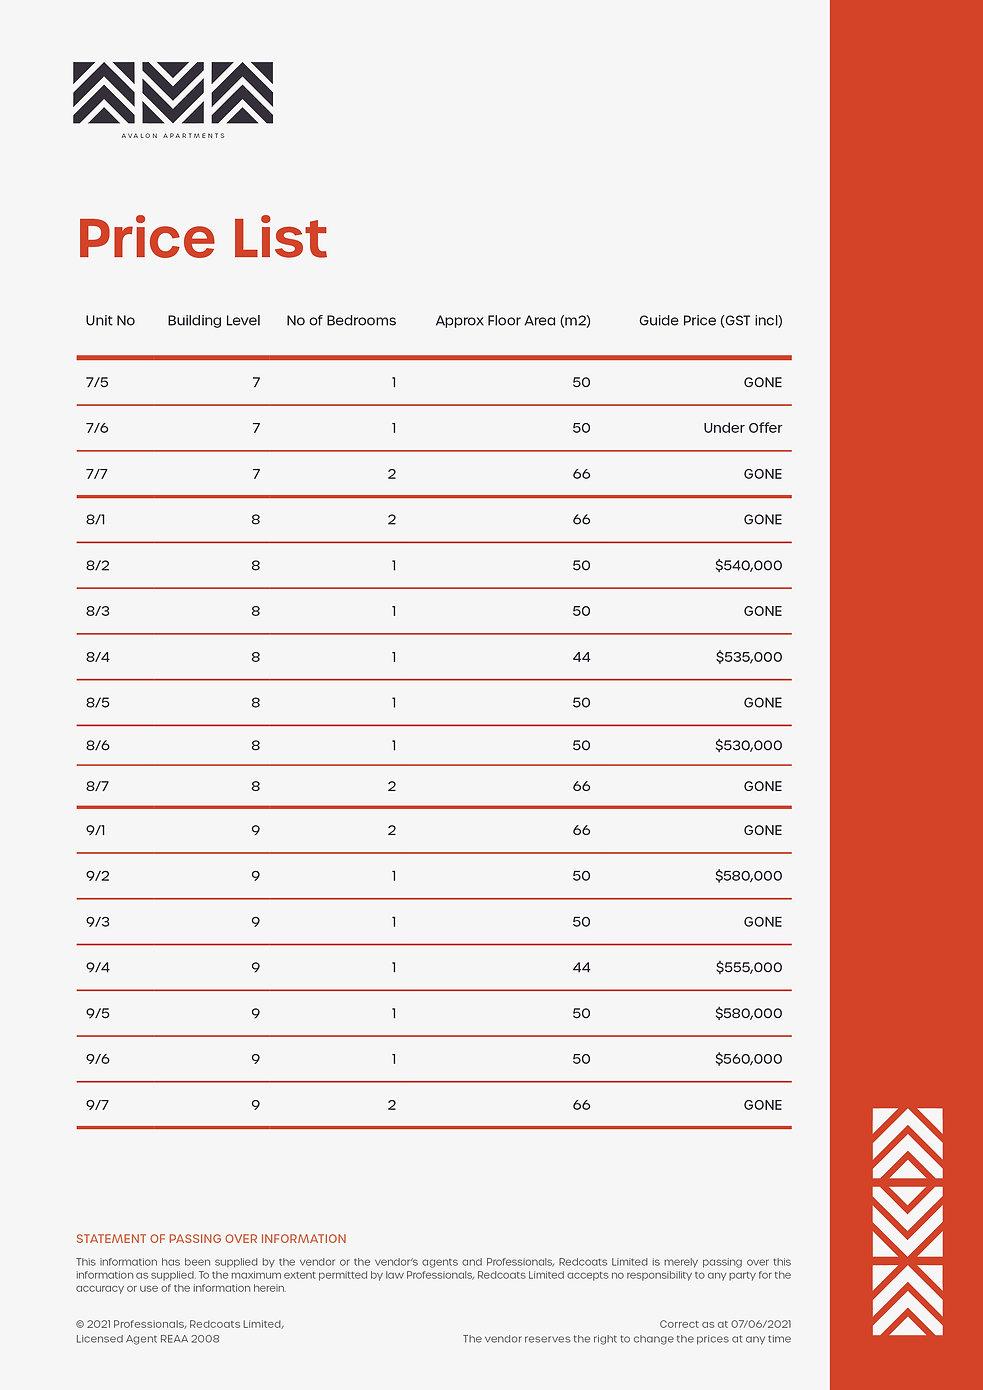 AA - Price List3.jpg